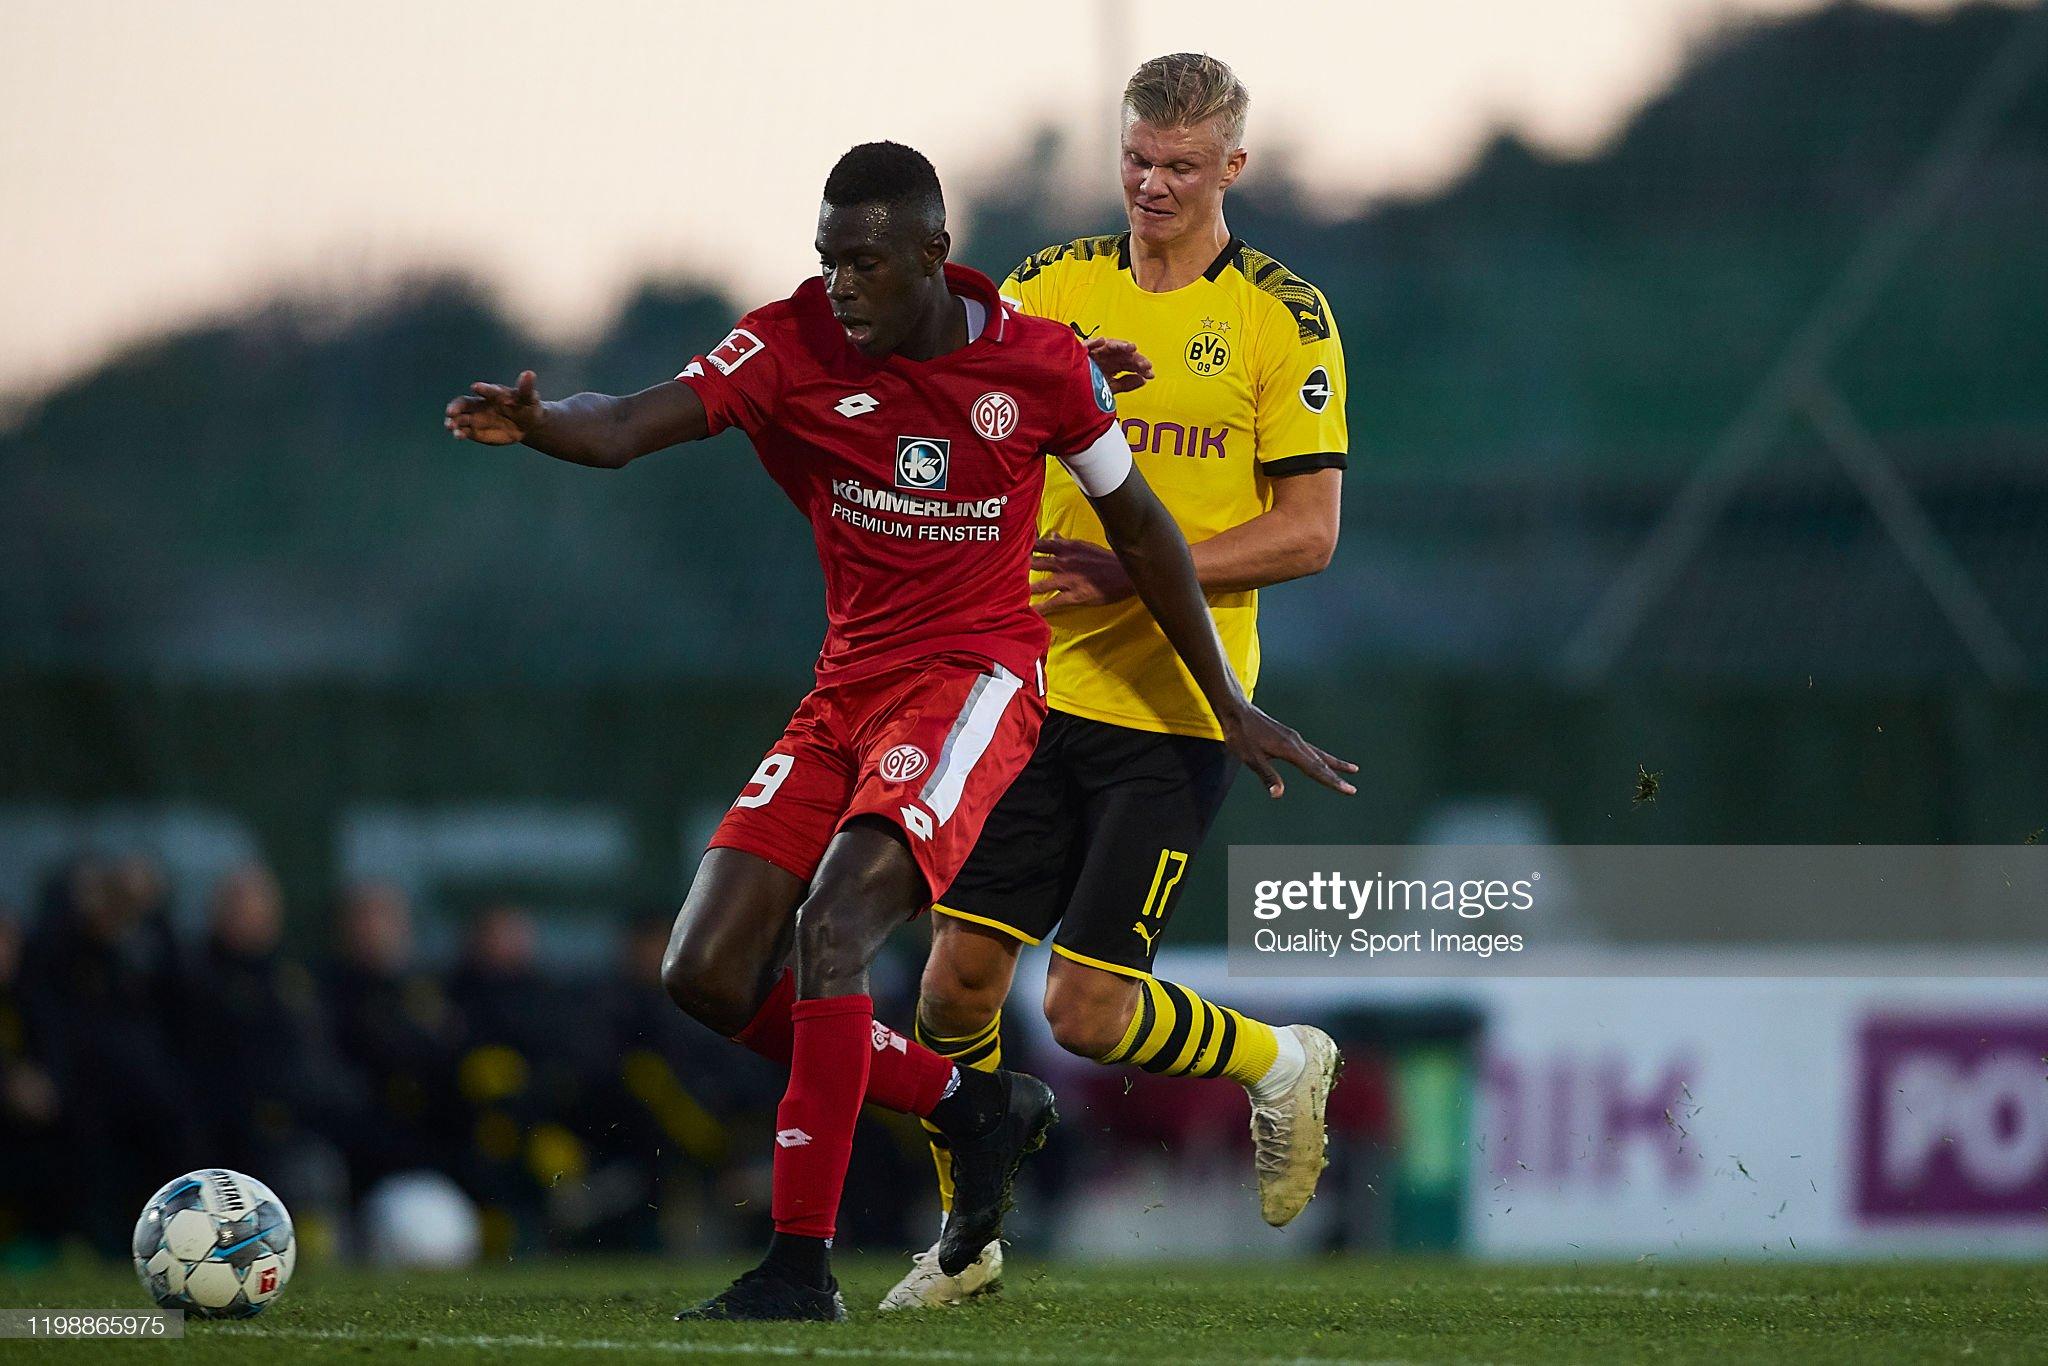 Dortmund vs Mainz Preview, prediction and odds